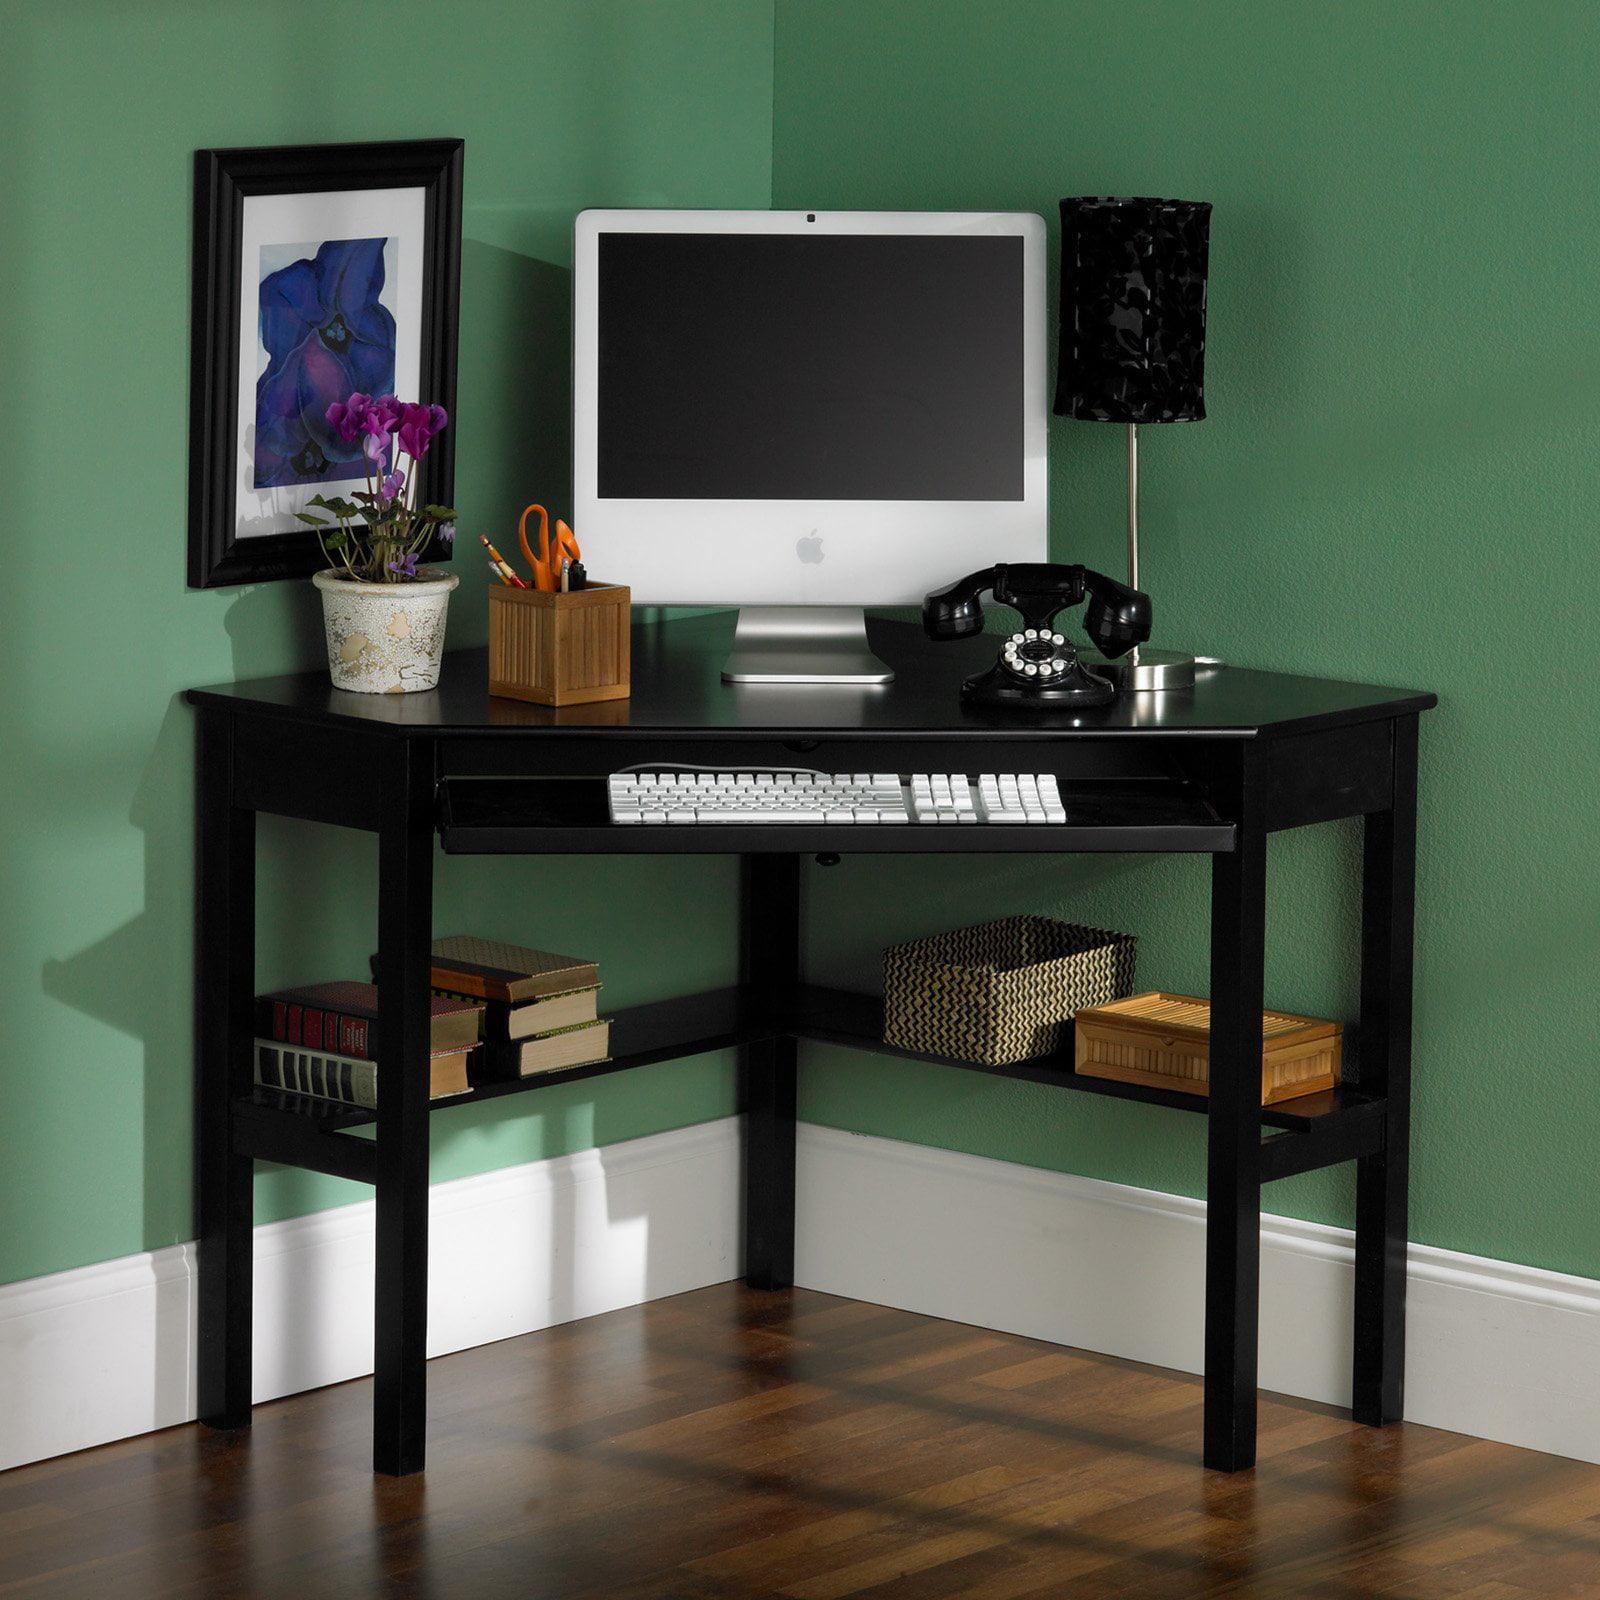 Southern Enterprises Black Corner Computer Desk   Walmart.com